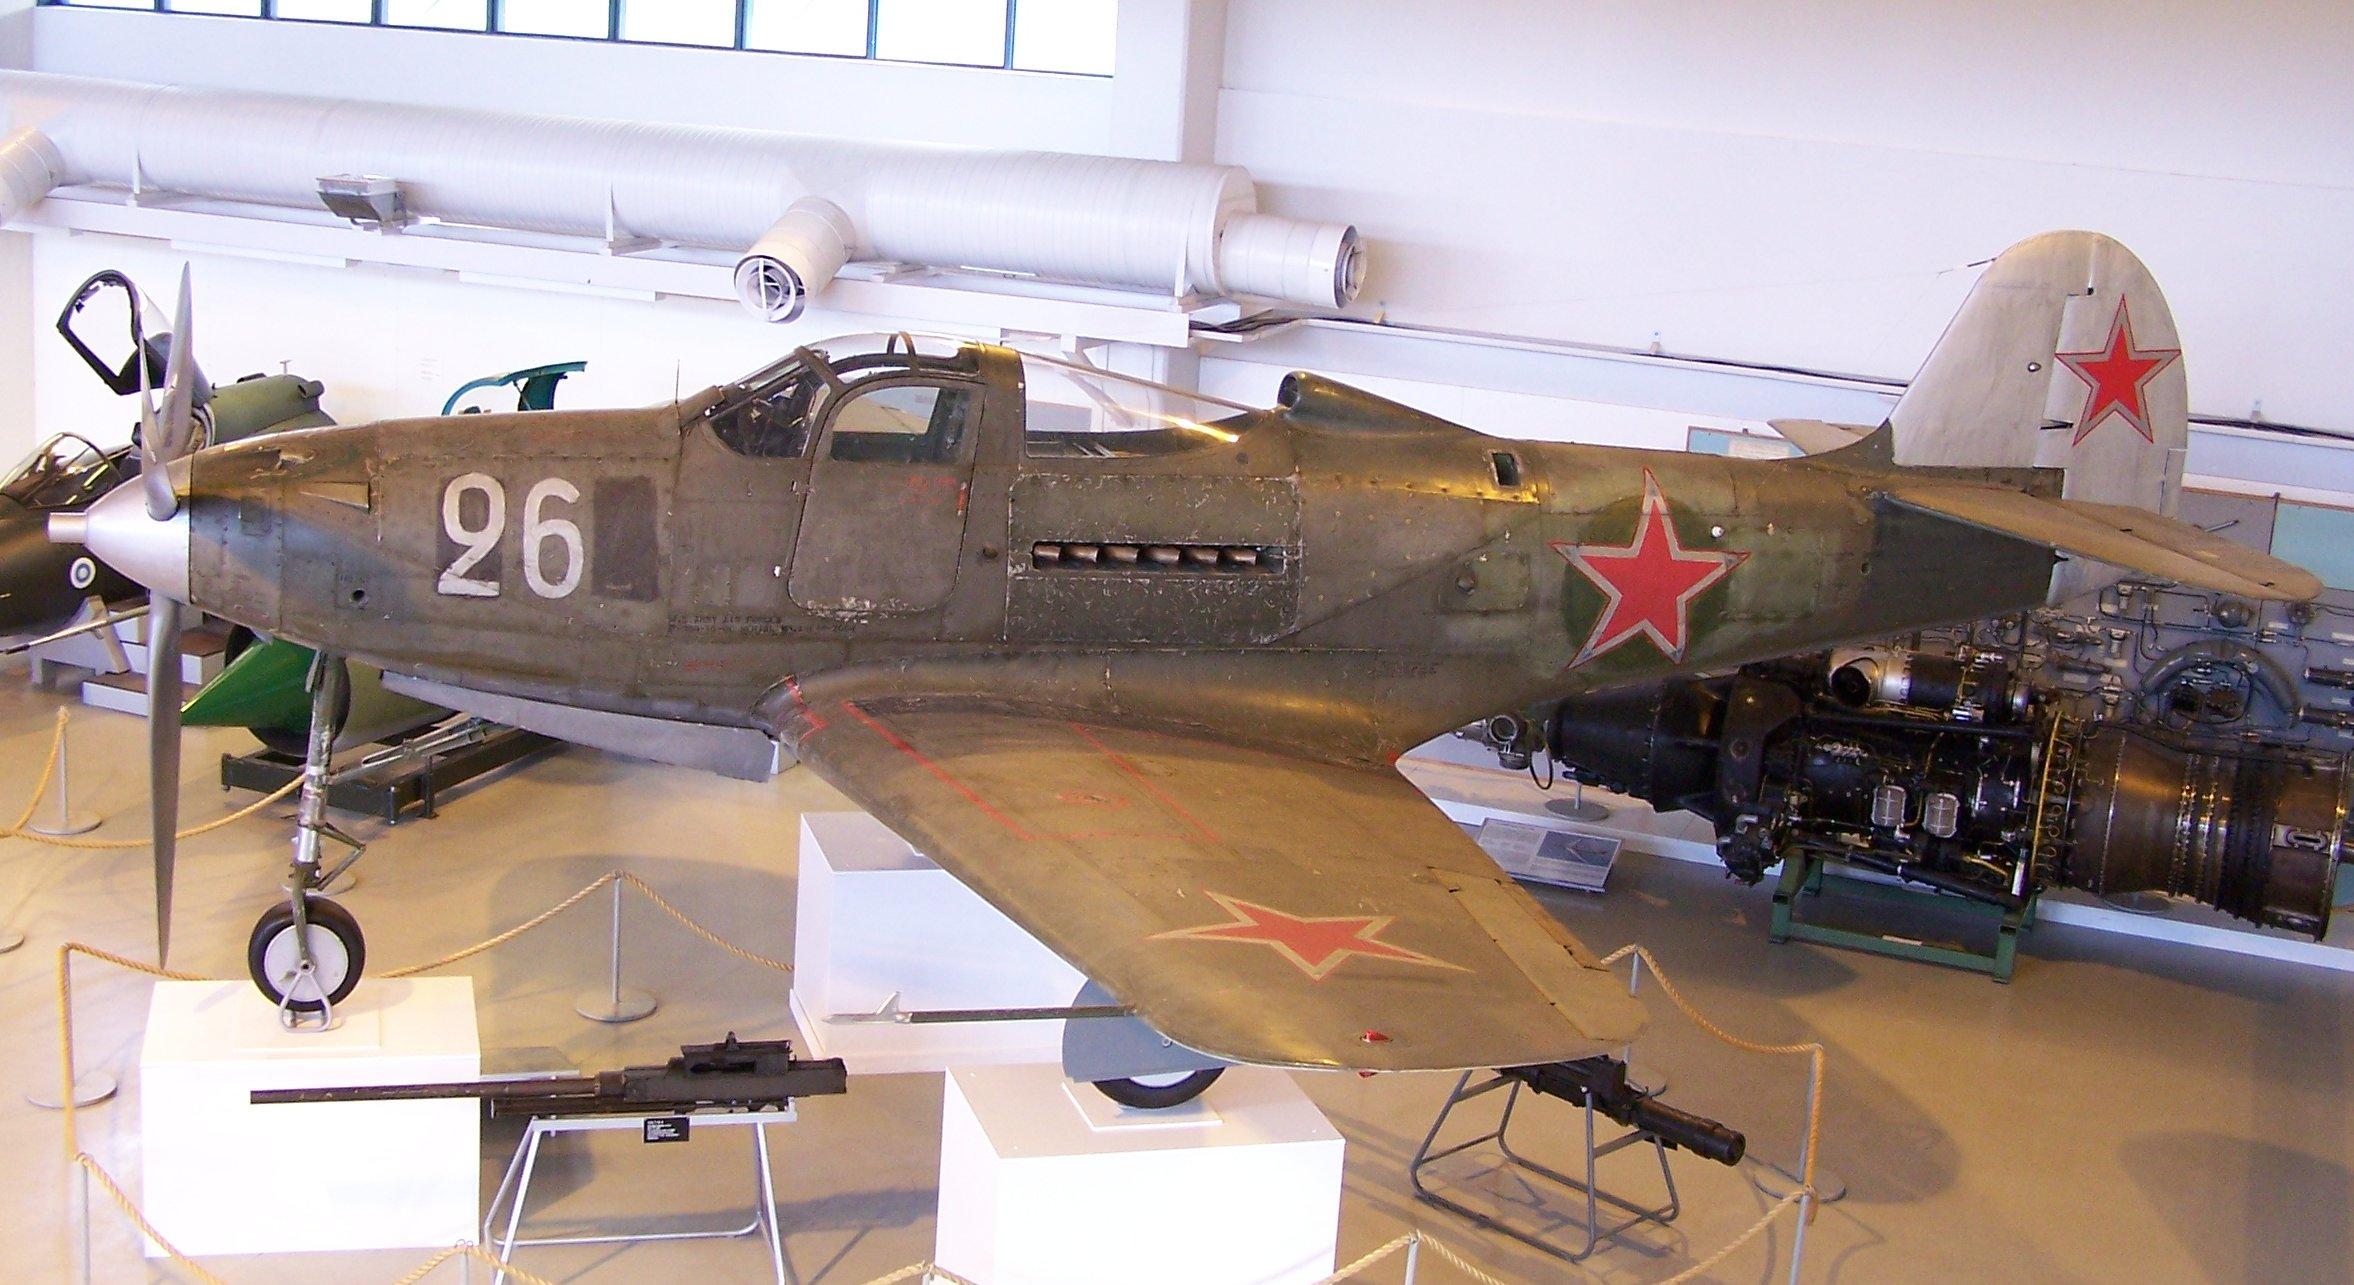 PT19 Rebuild Project P-39_Airacobra_2006-06-15